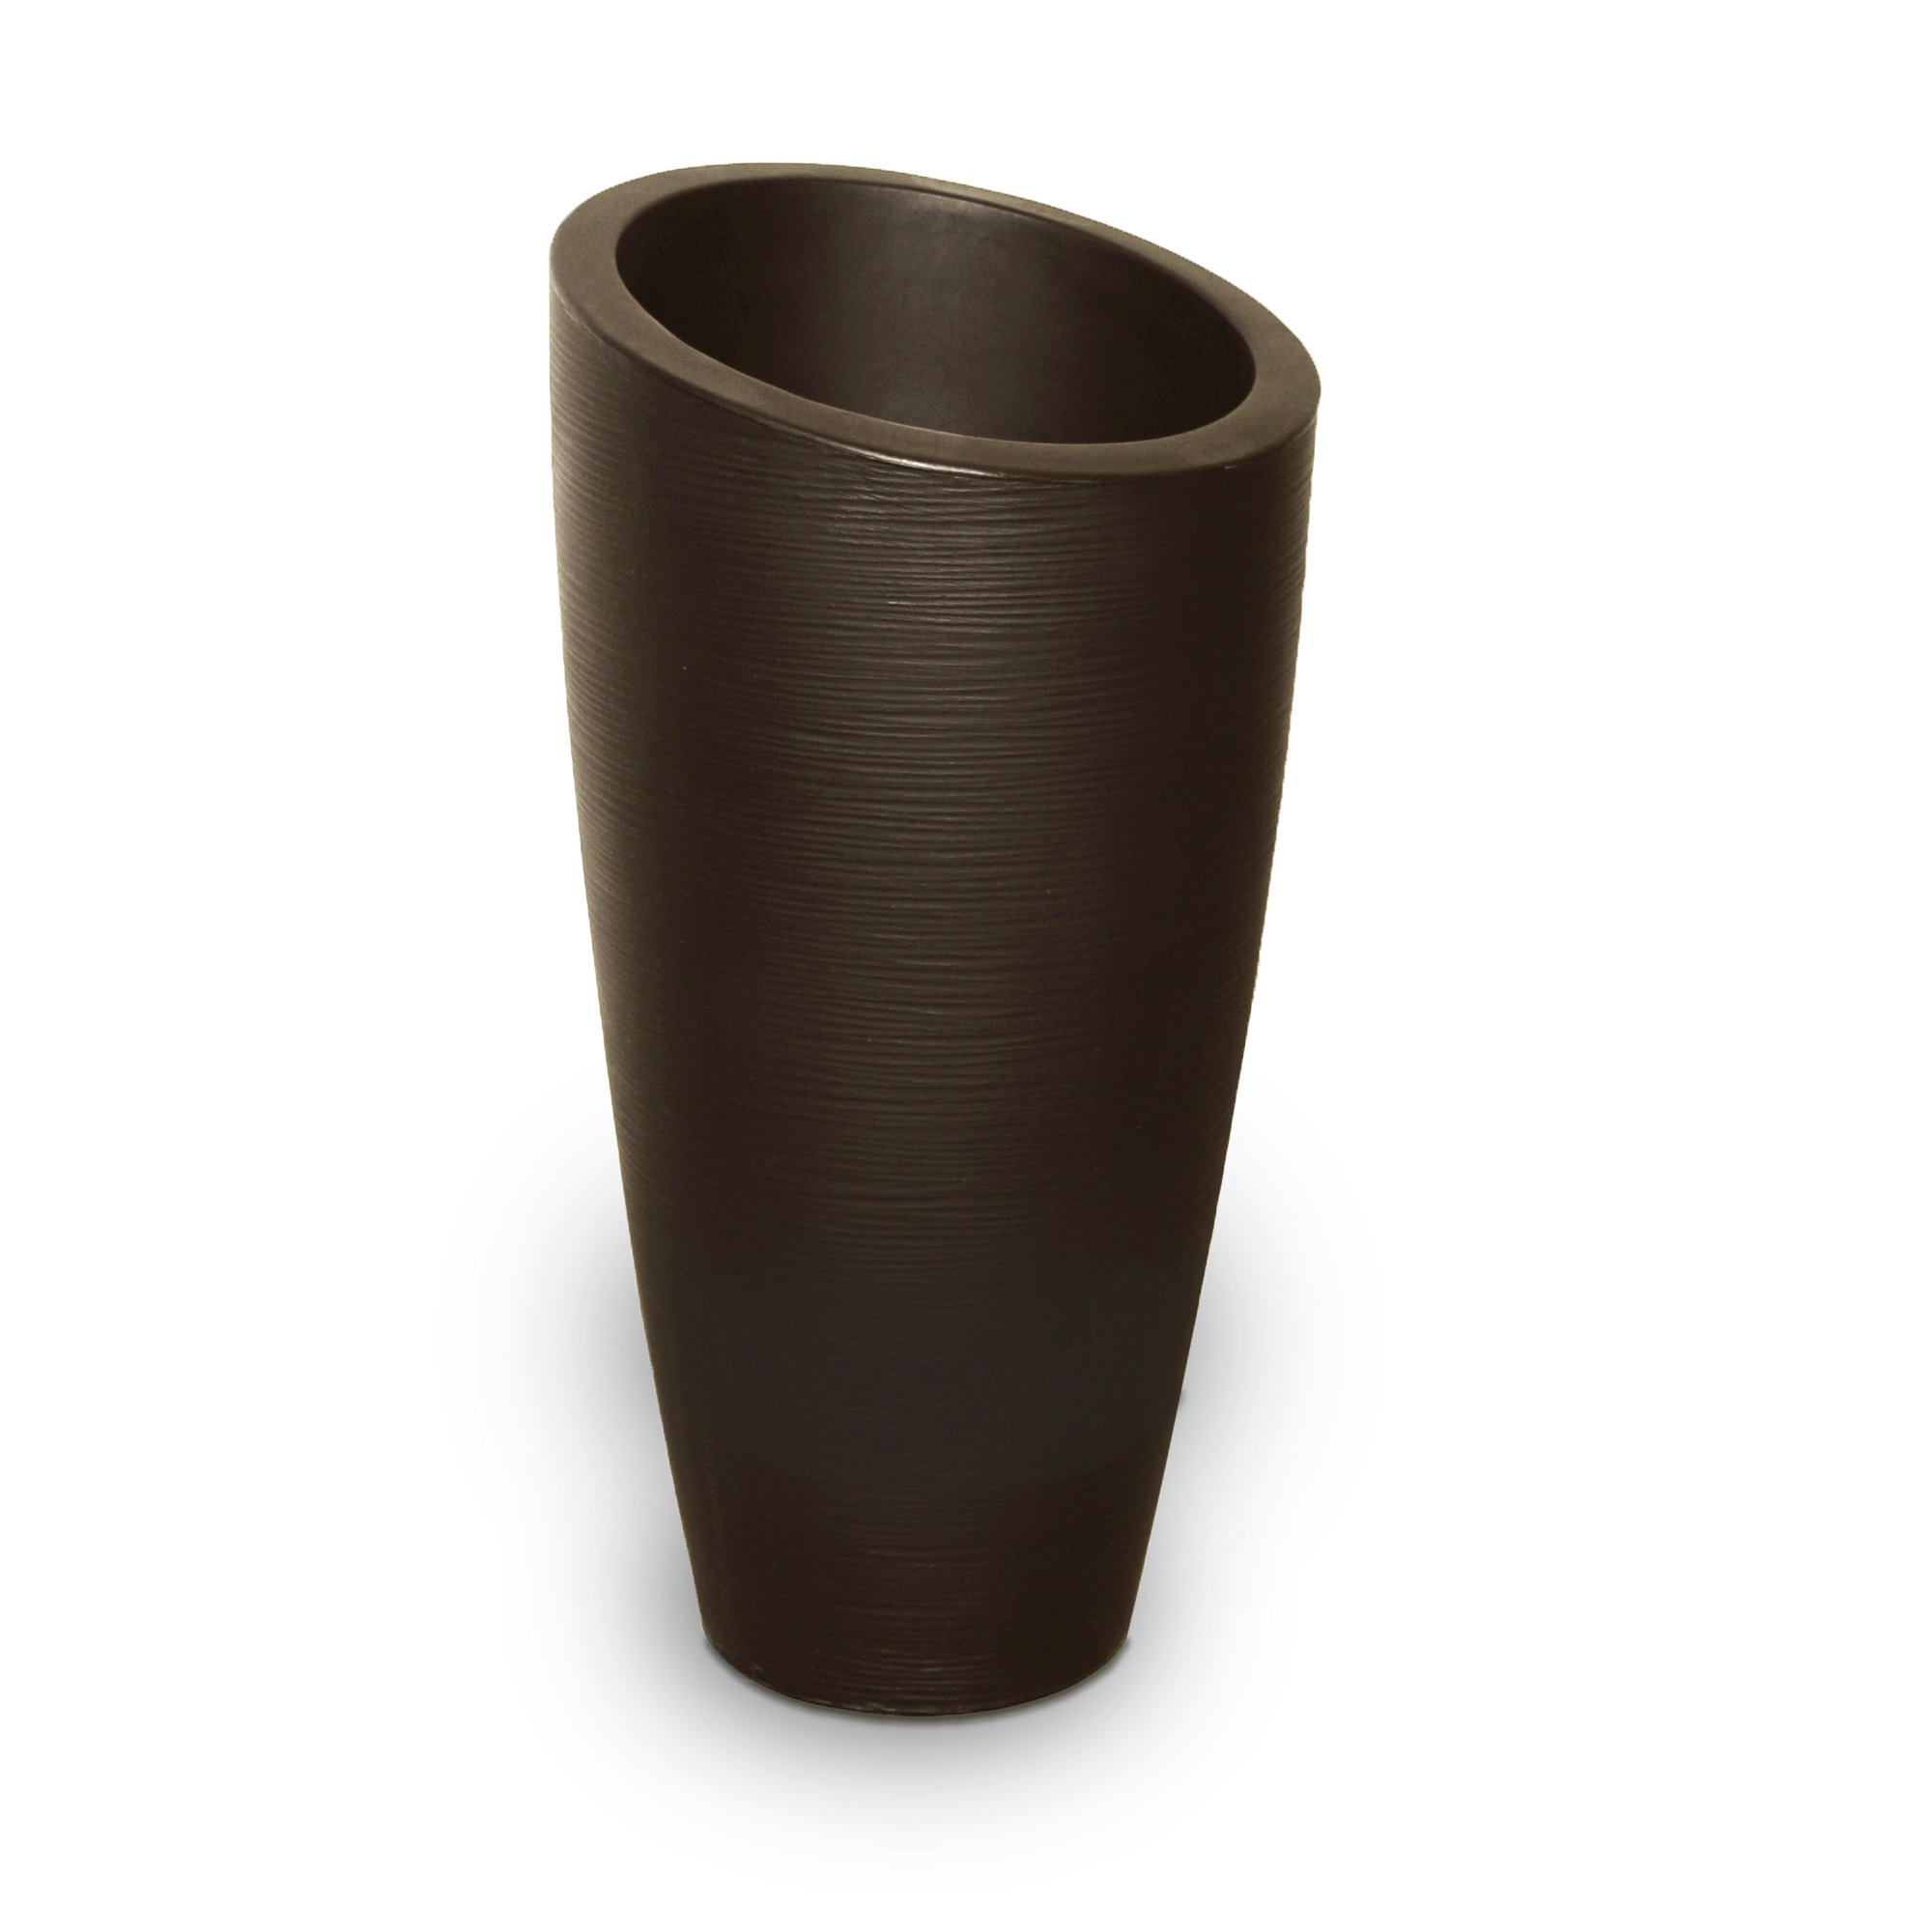 Mayne 8880-ES Polyethylene Planter, Espresso by Mayne